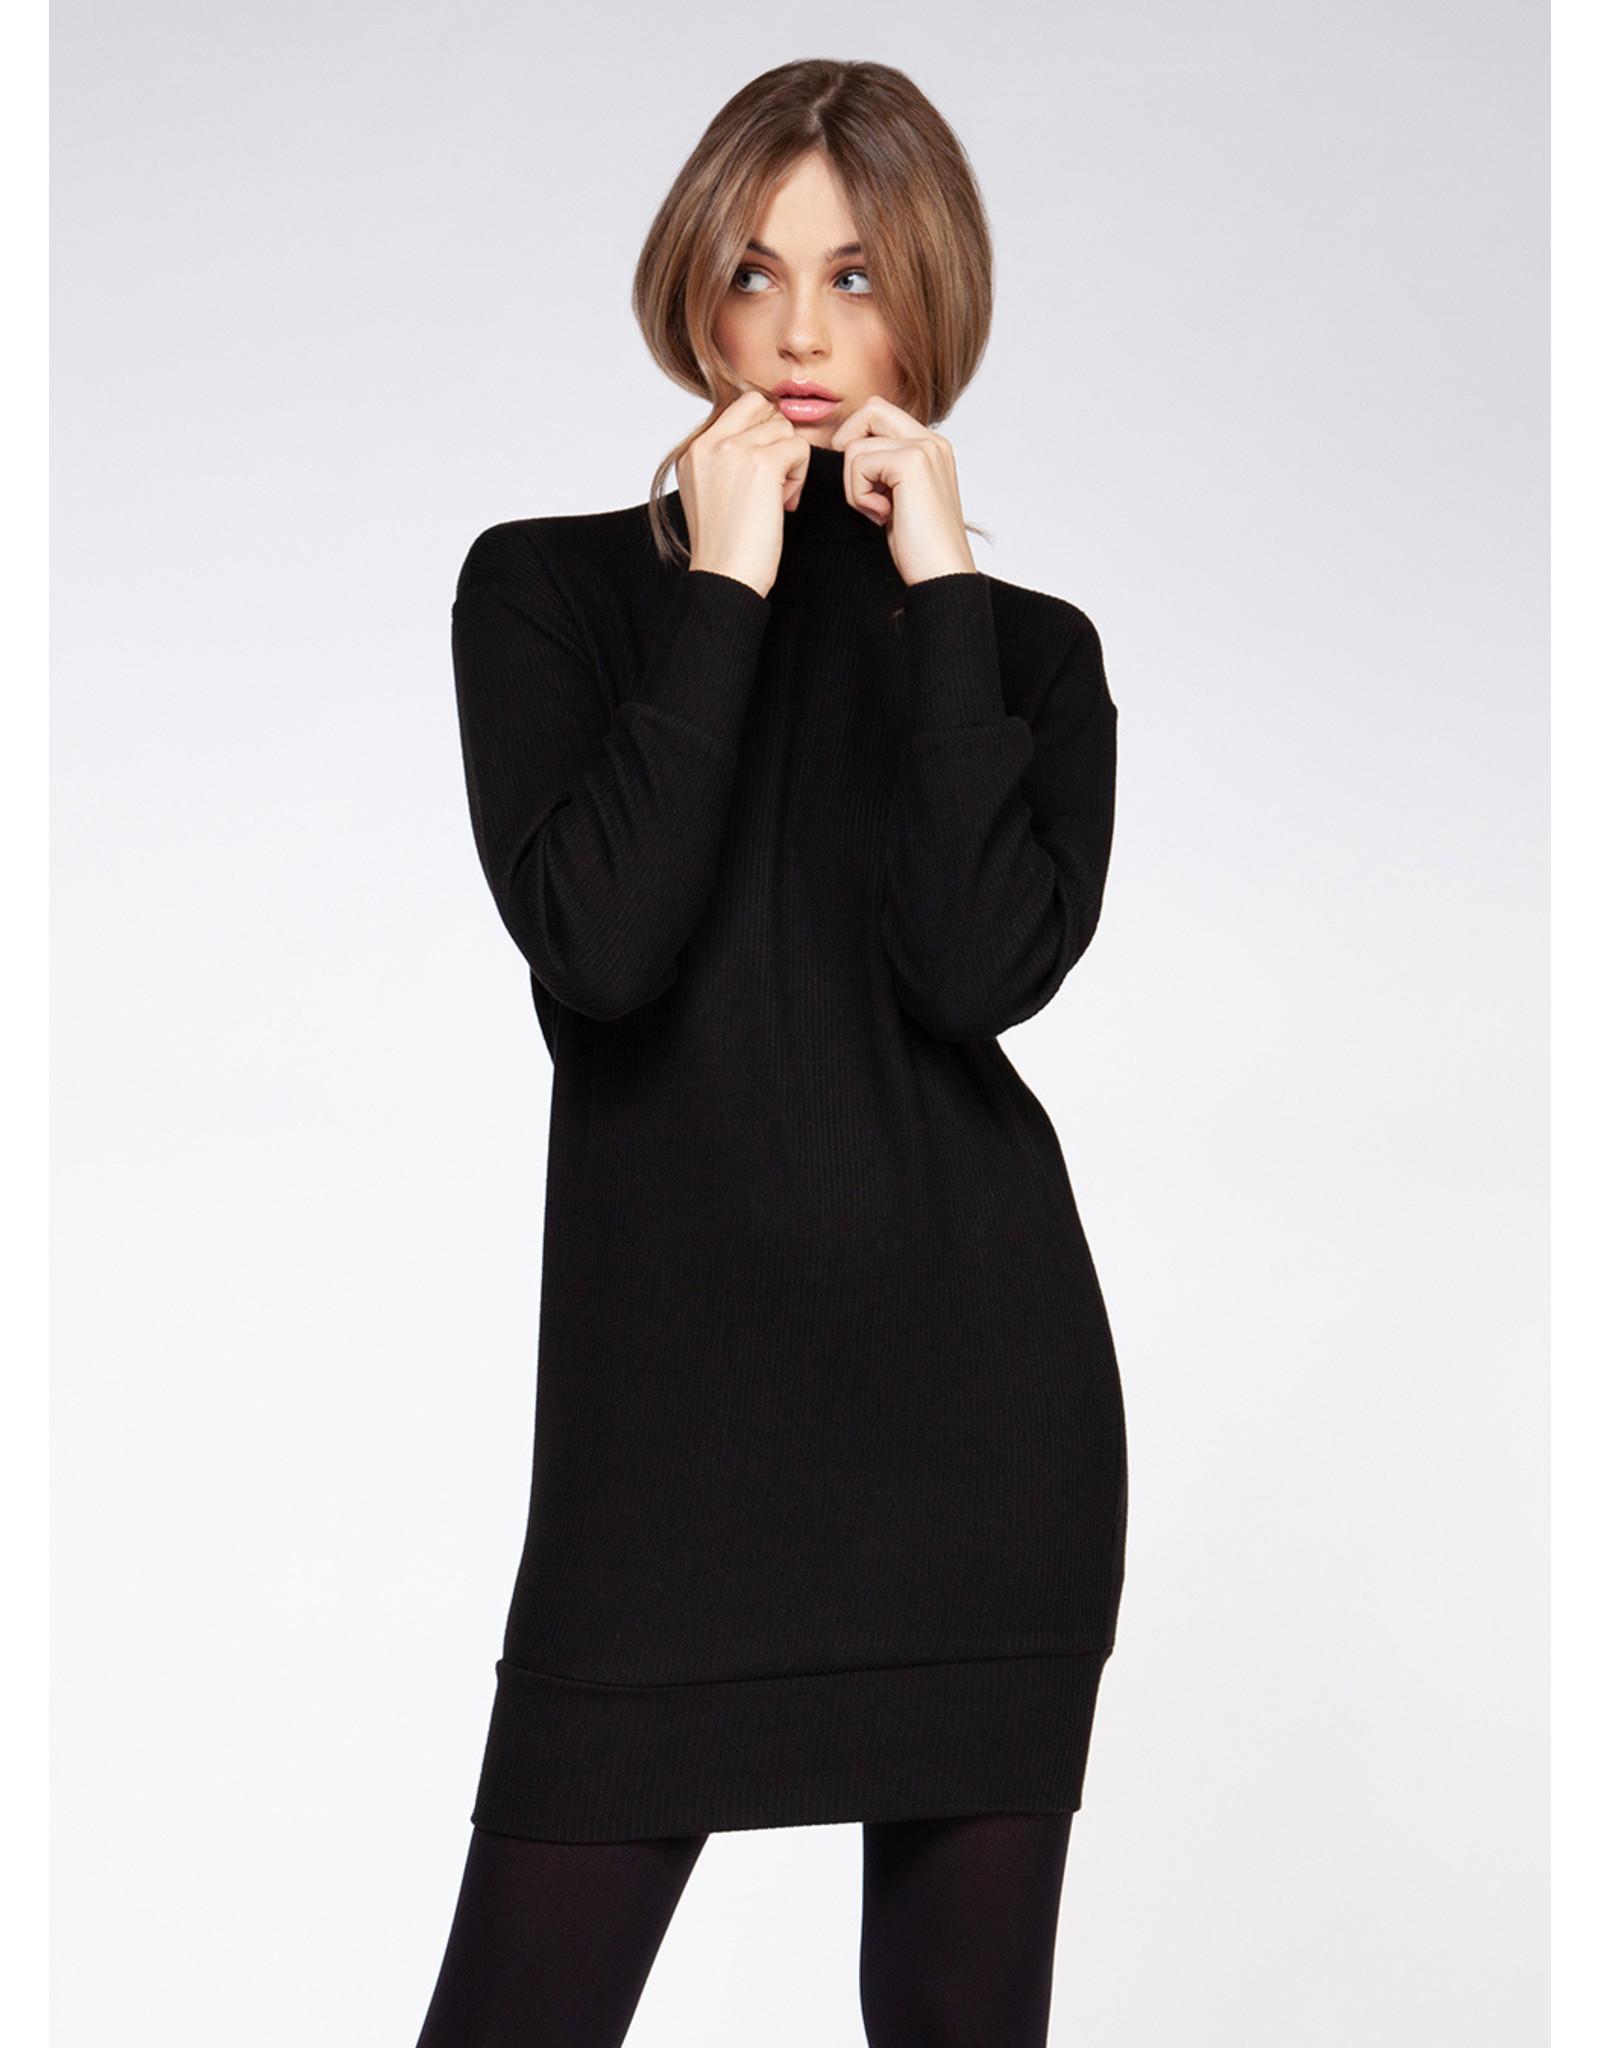 Long Sleeve, Doman Mock Neck Sweater Dress